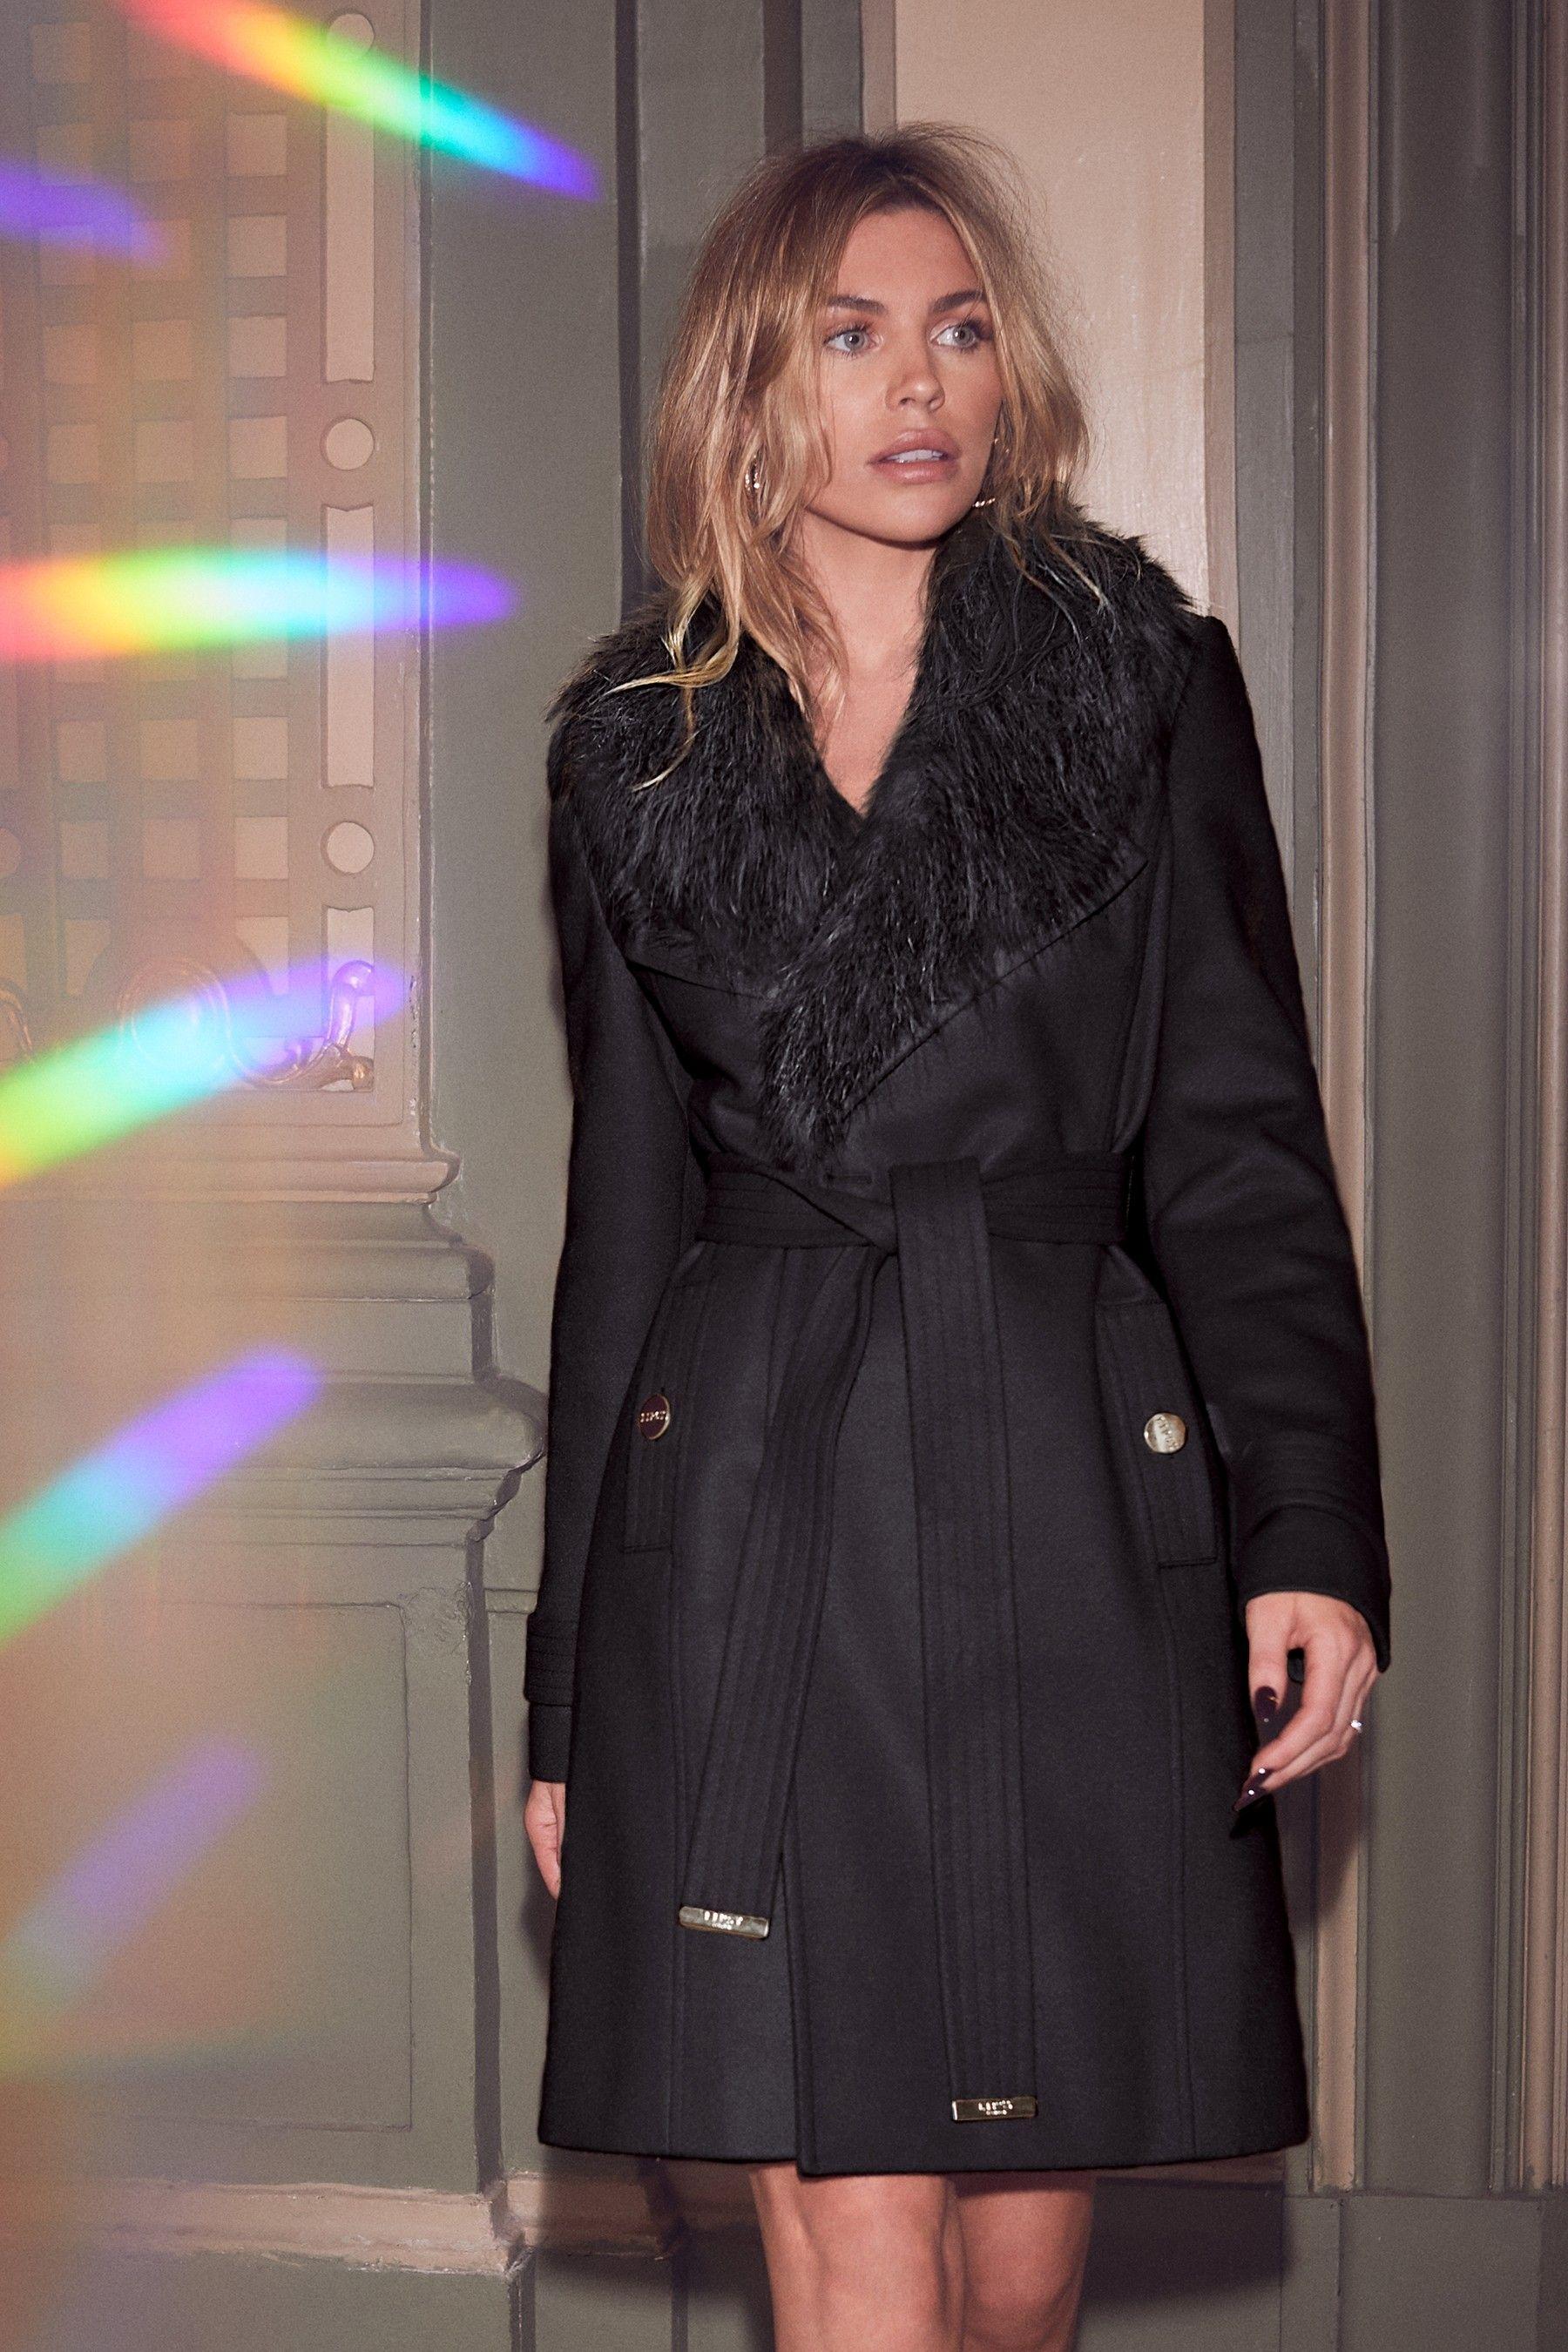 ea1aefd967d53 Womens Abbey Clancy x Lipsy Faux Fur Collar Wrap Coat - Black ...